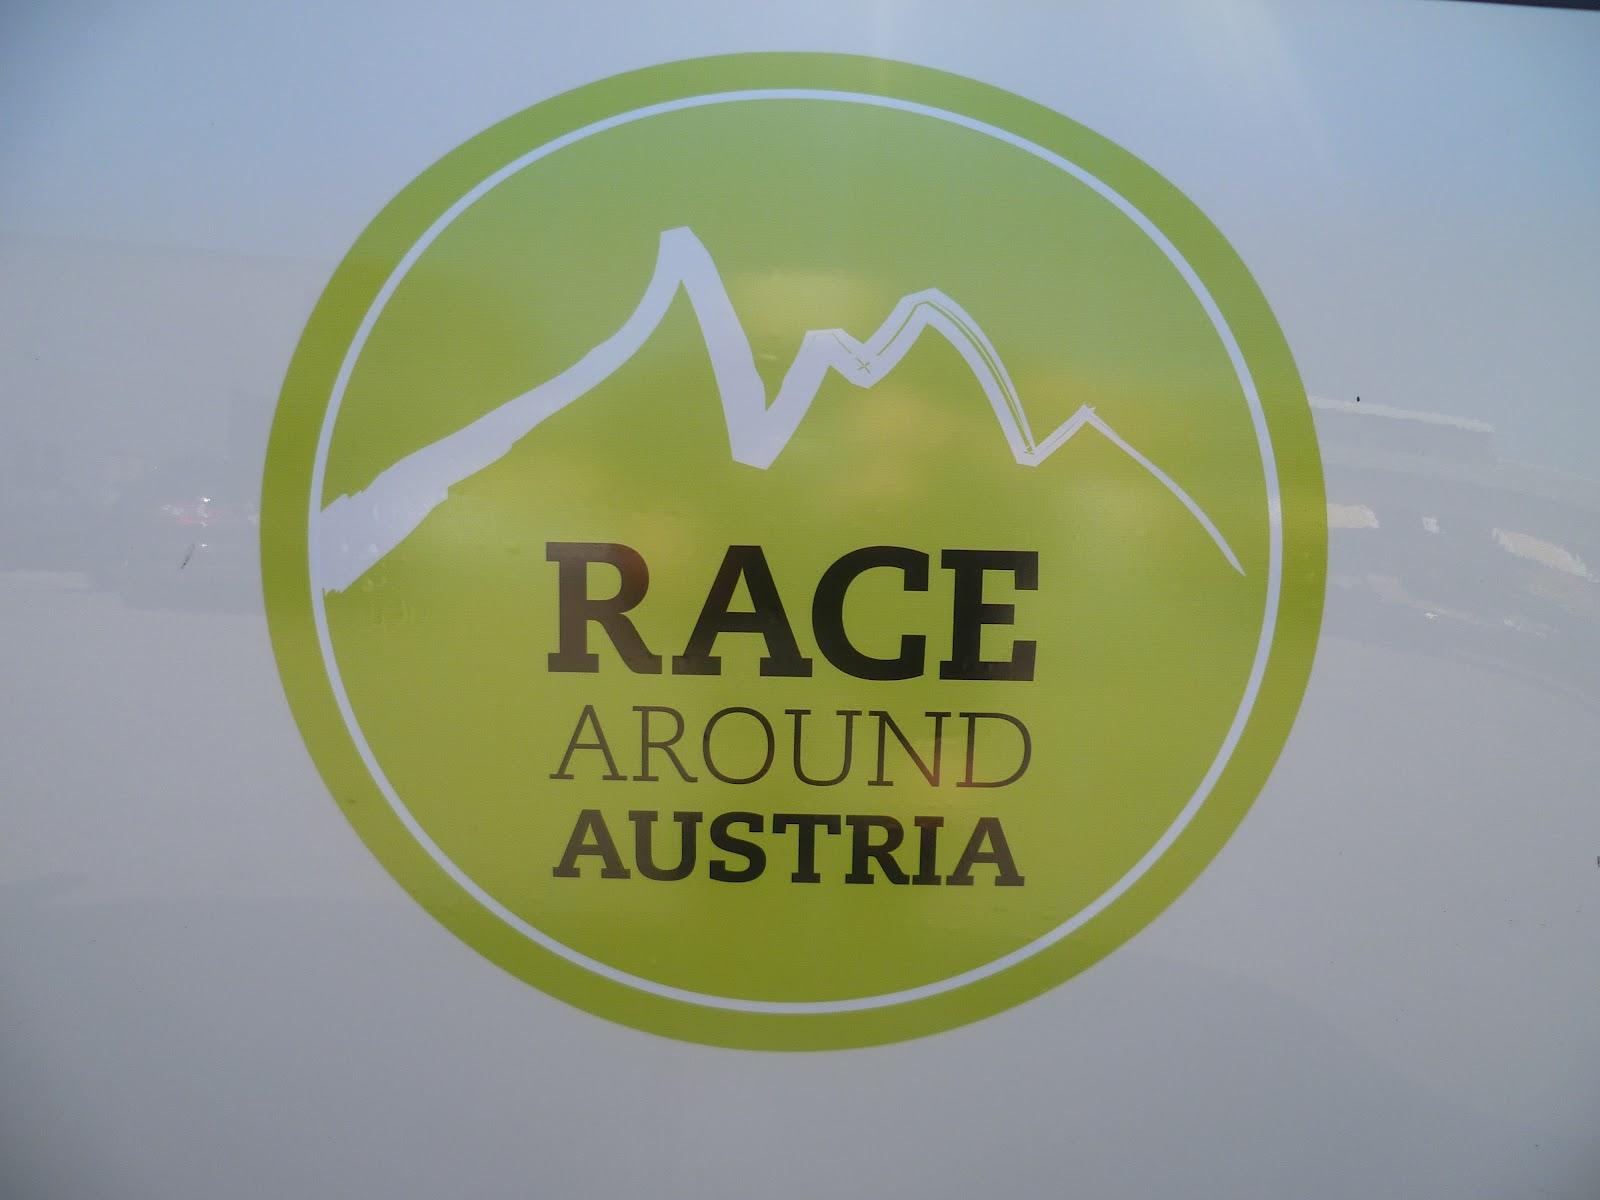 Race Around Austria